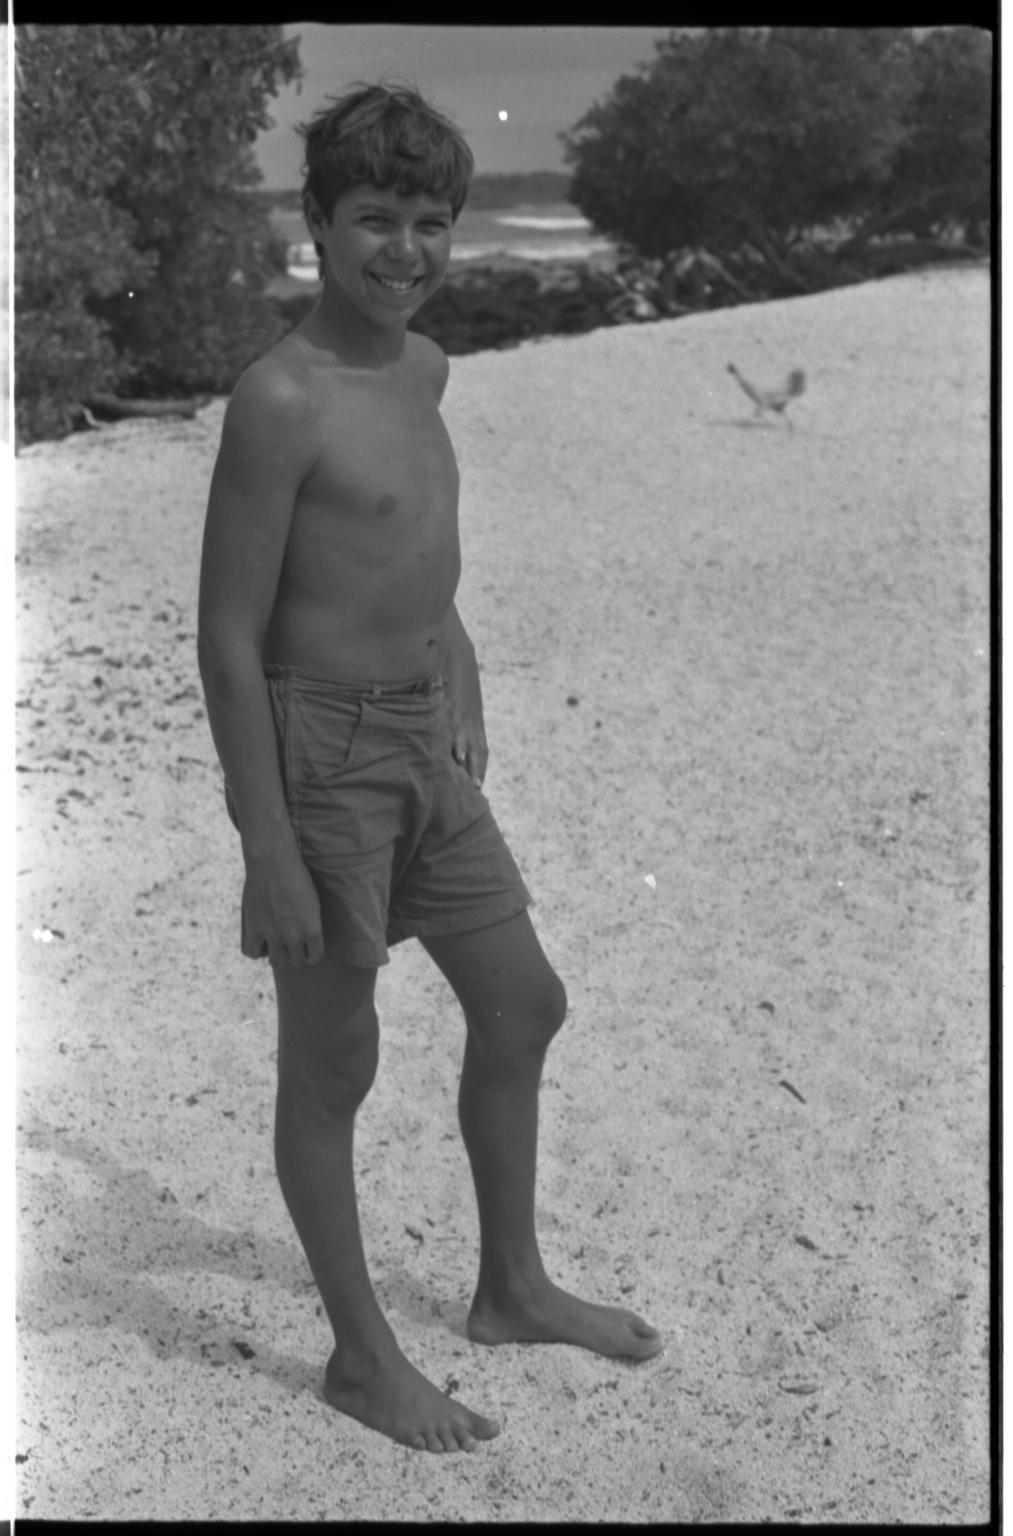 Boy in Galapagos Islands.